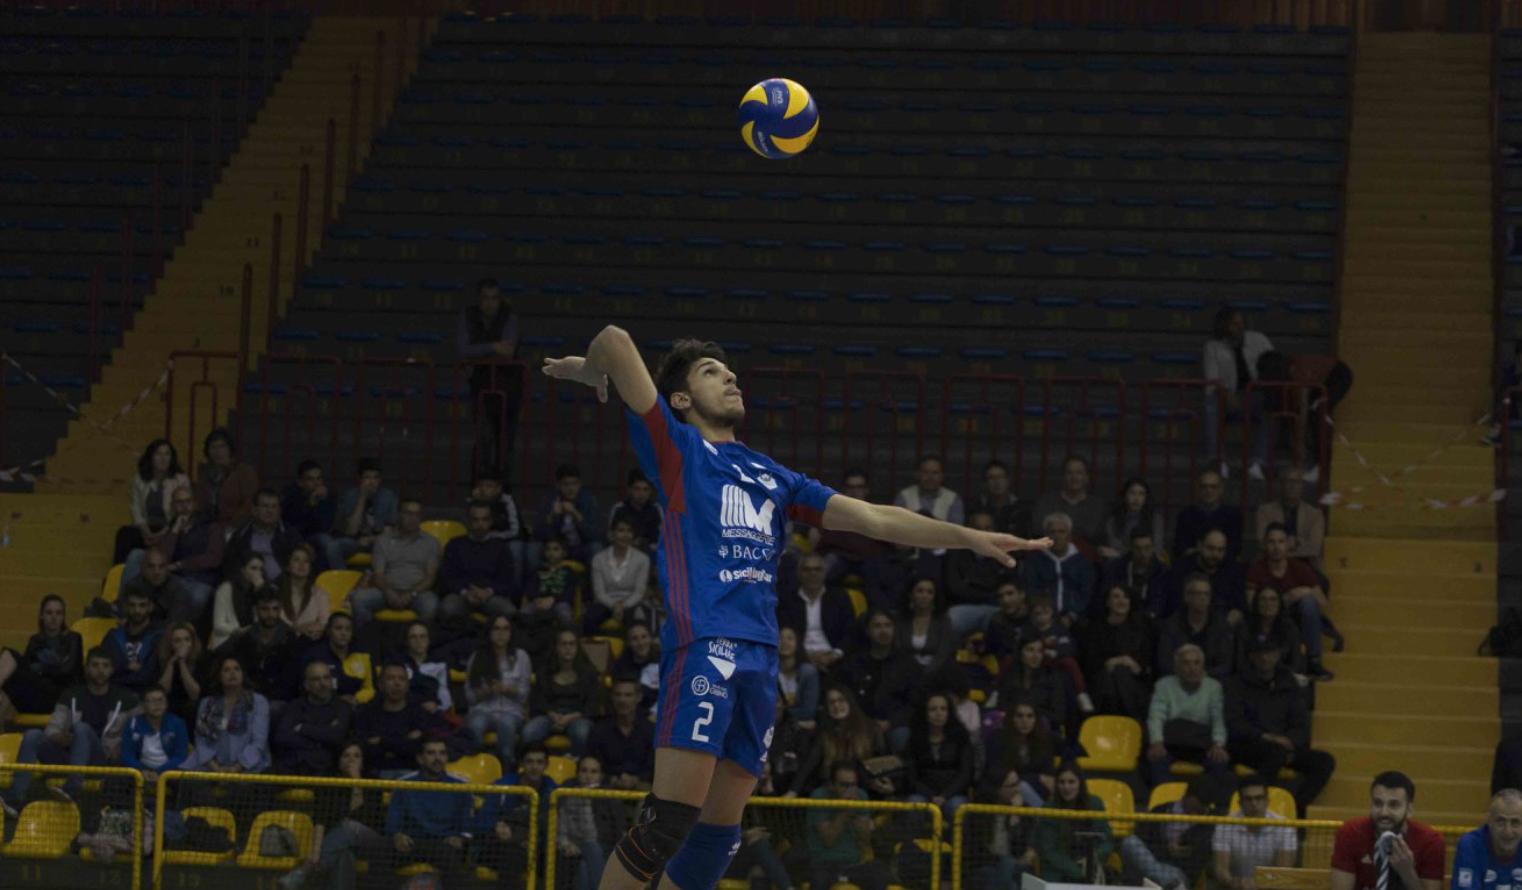 Volley Catania - Federico Reina